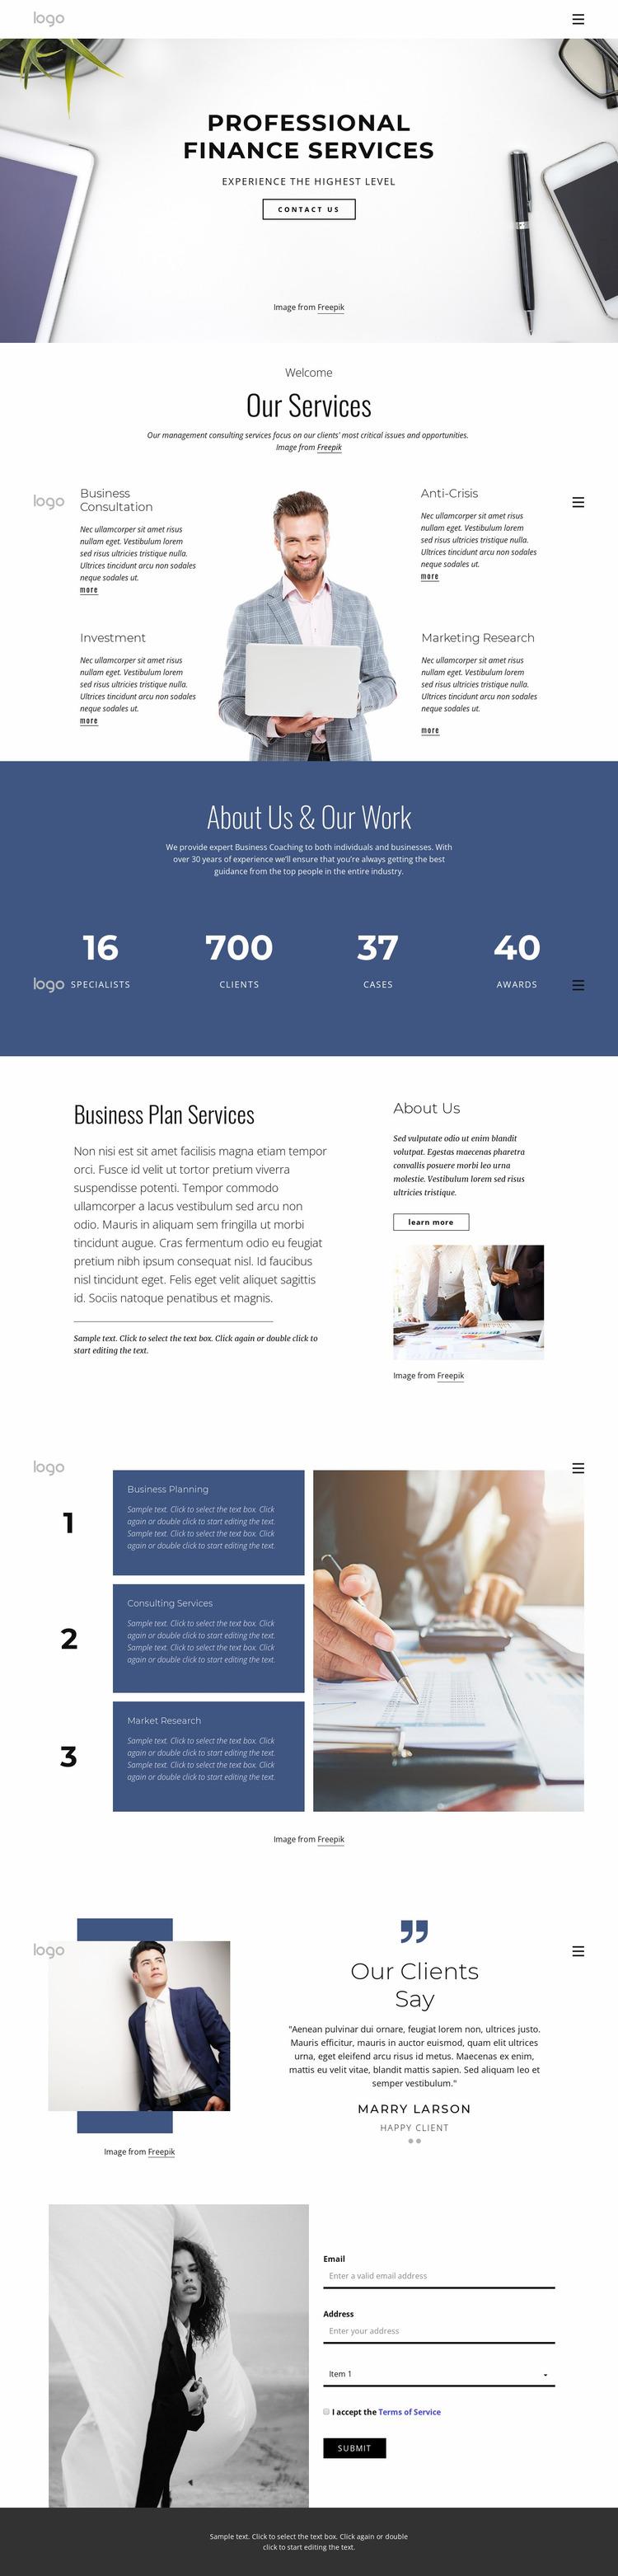 Professional finance services Website Mockup